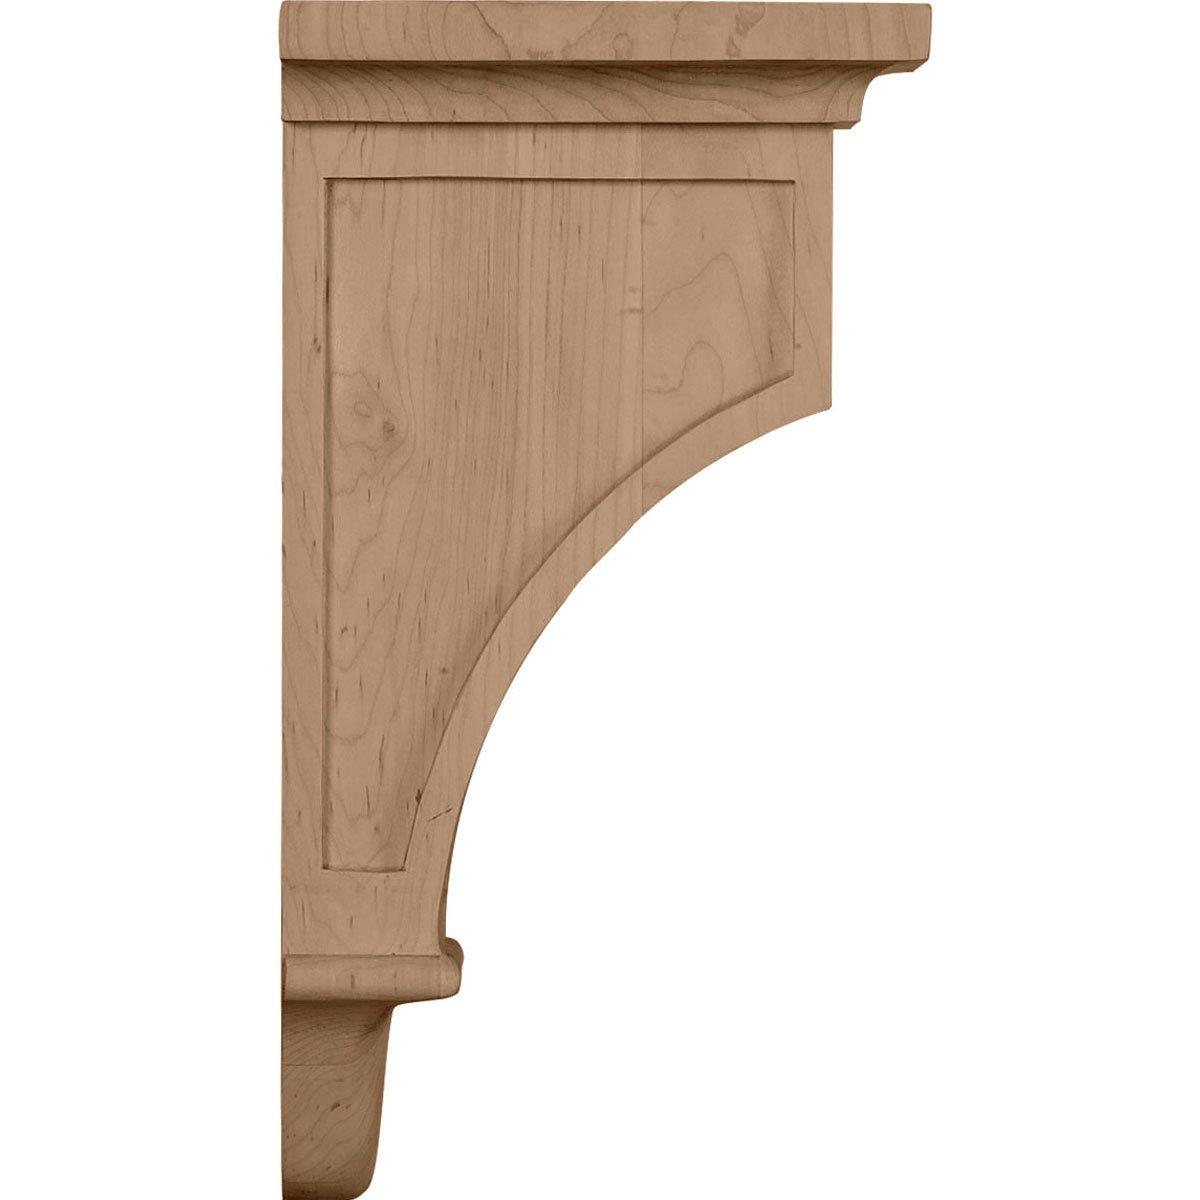 Rubberwood Ekena Millwork COR06X04X12ARRW 6-Inch W x 4 3//4-Inch D x 12-Inch H Arts and Crafts Corbel